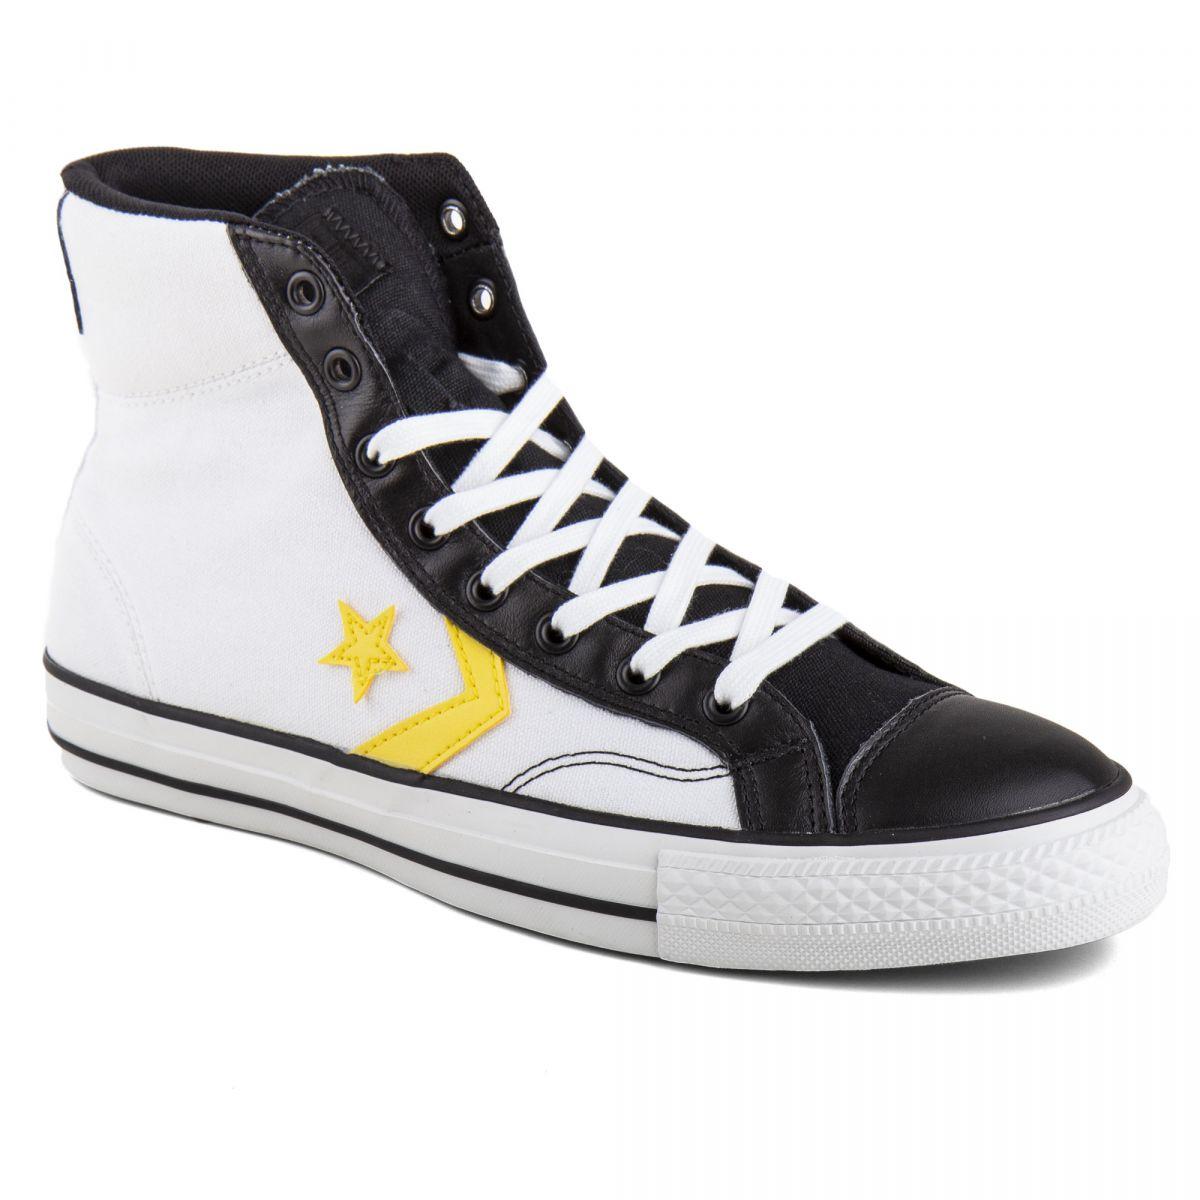 chaussure montante converse